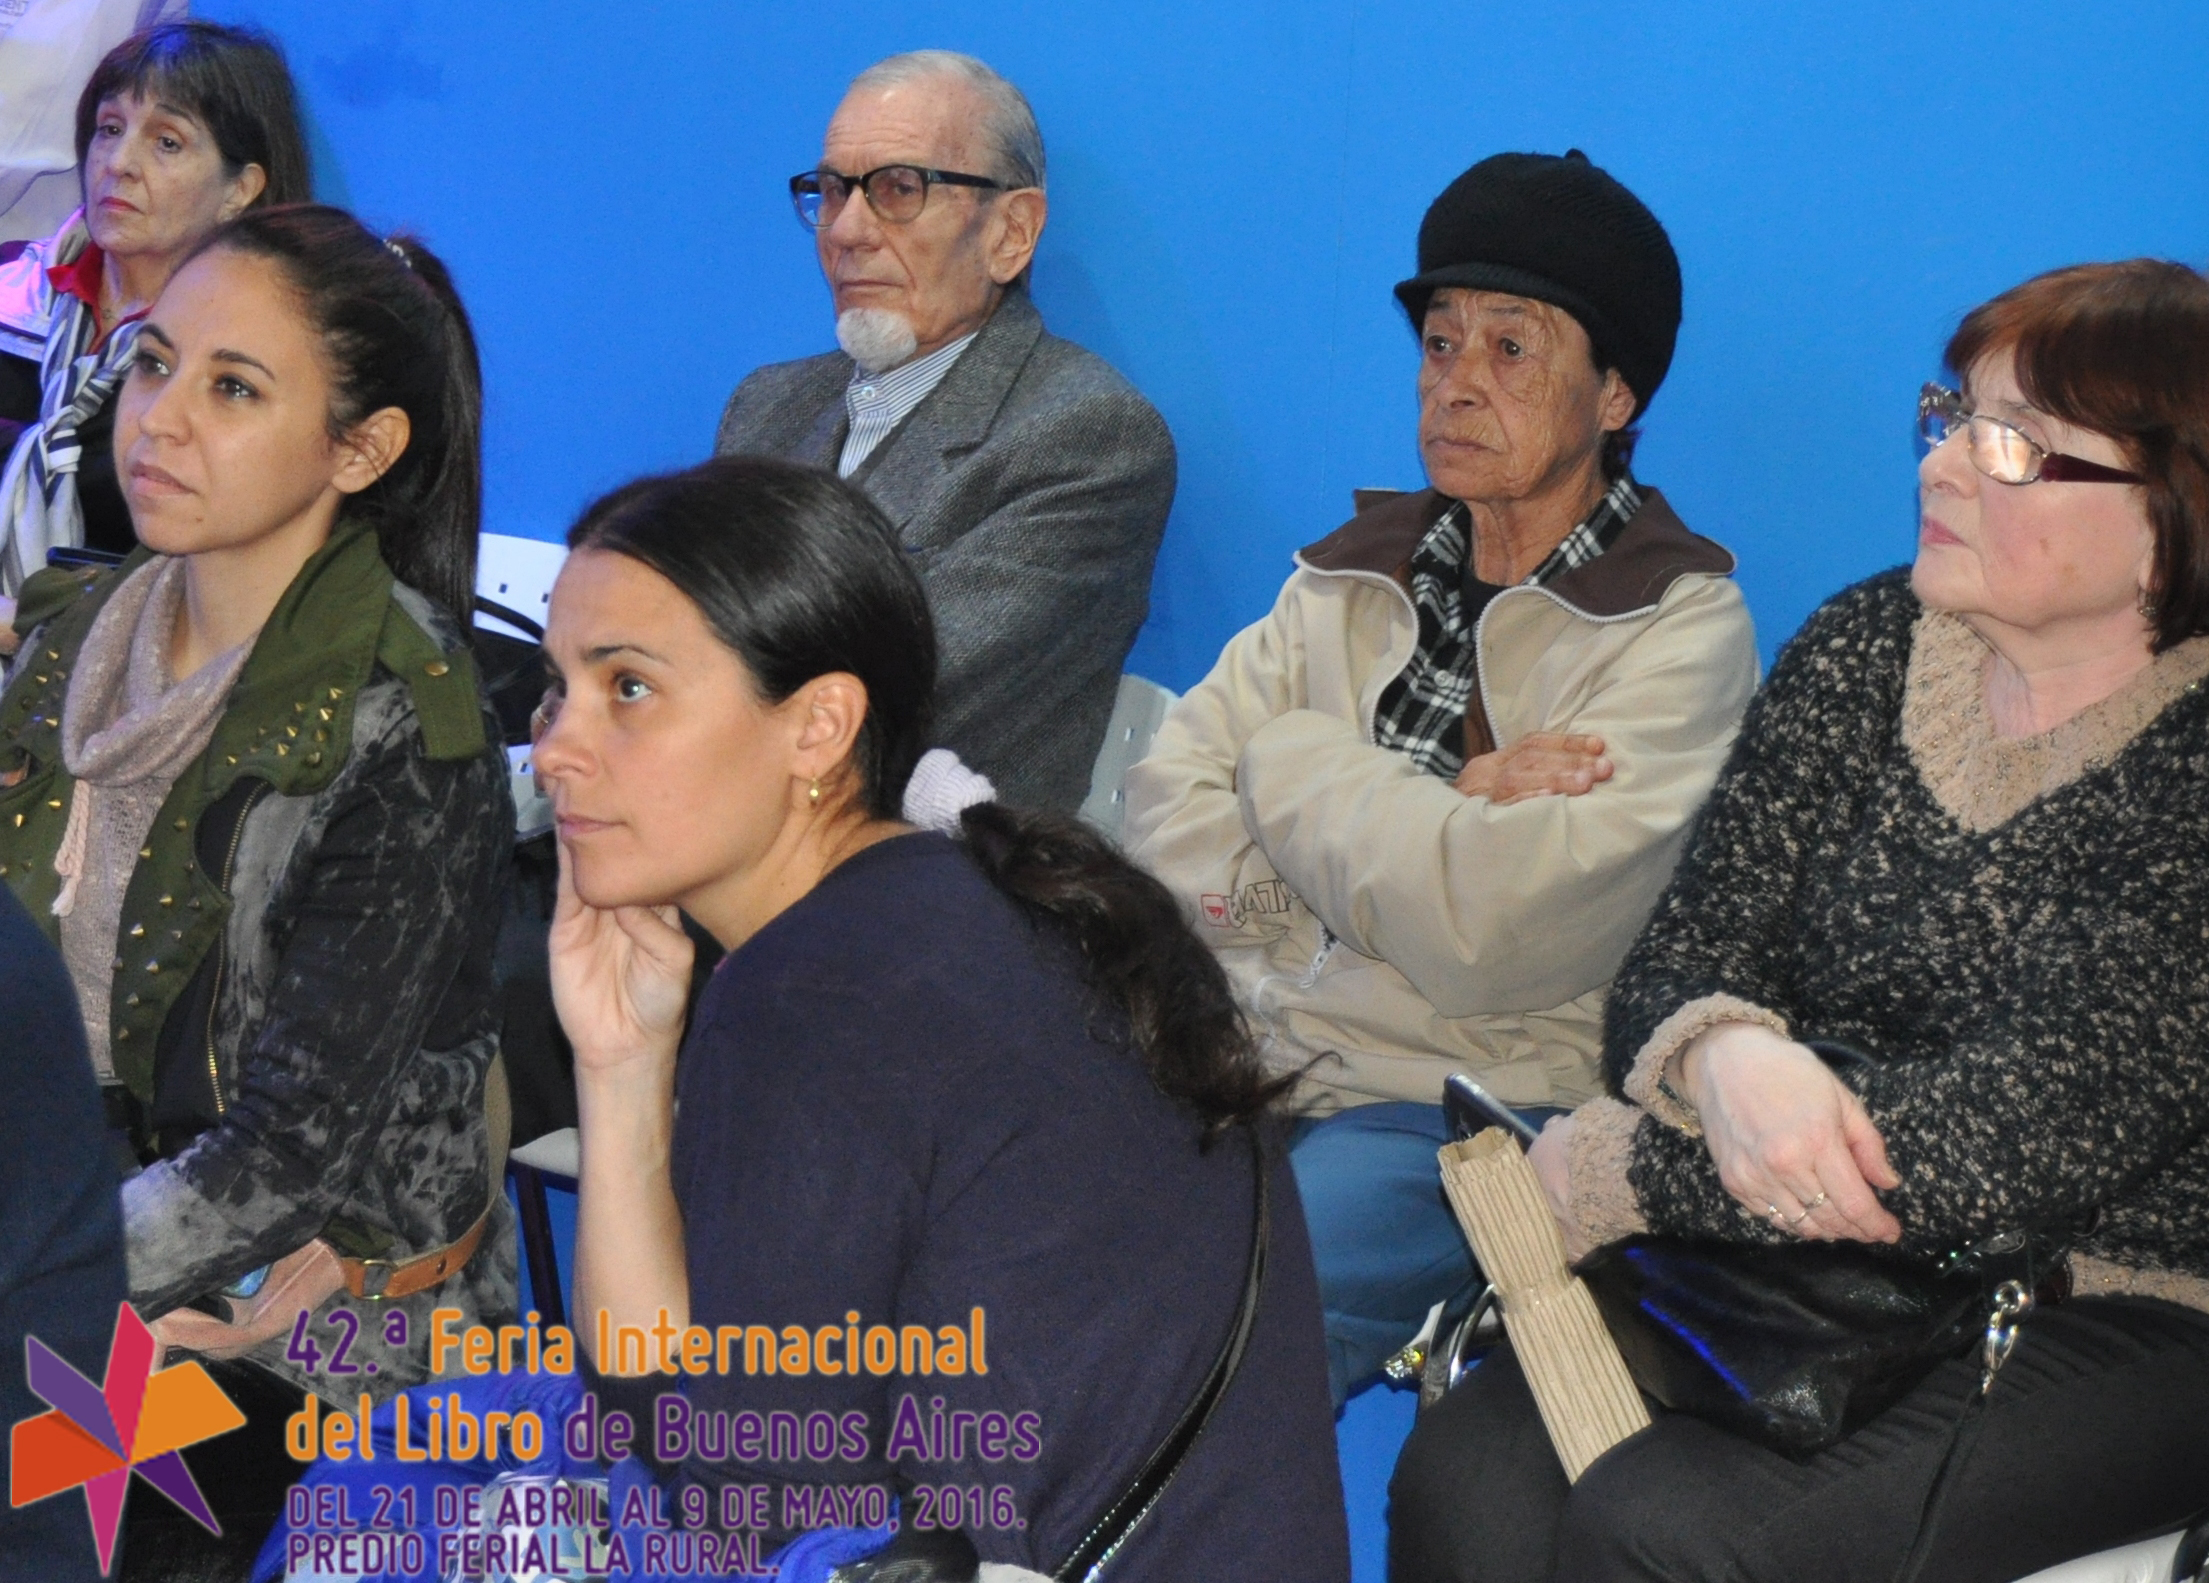 03-Buffa-Becerra-Ruibal-Ruta-del-Esclavo-Cordoba-UNESCO-Feria-Libro